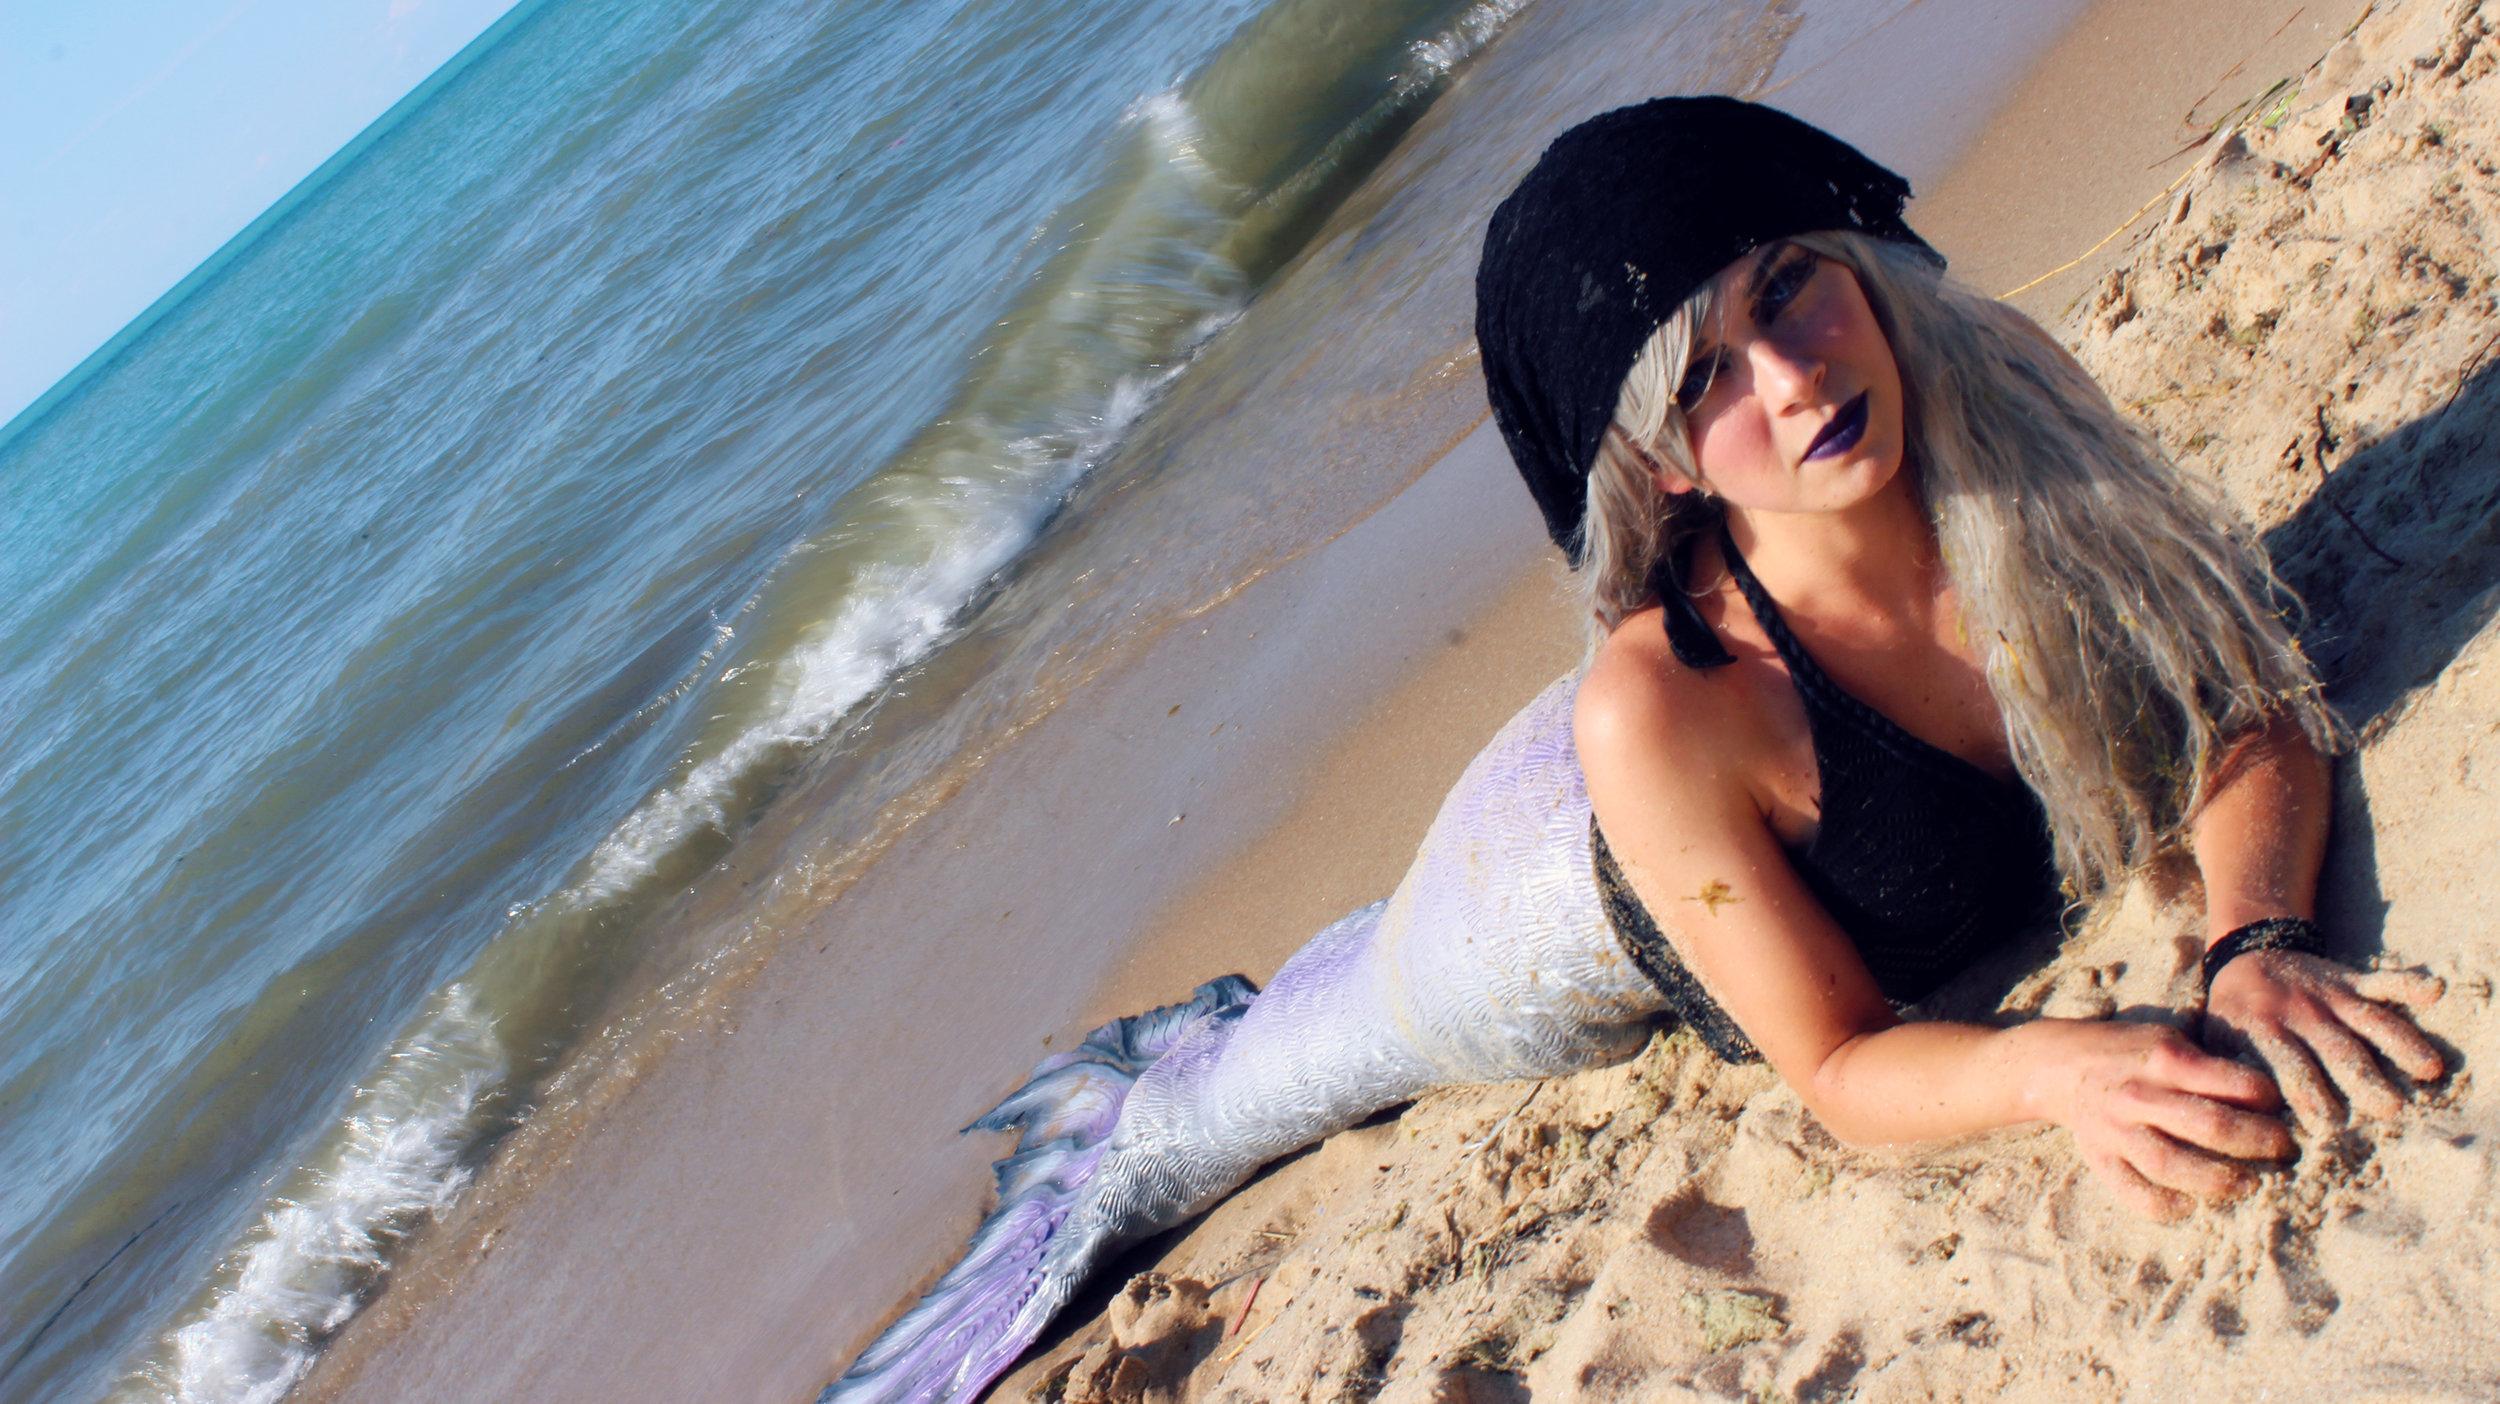 silicone-mermaid-tail-mermaid-pirate-on-the-beach-sideways-purple.jpg